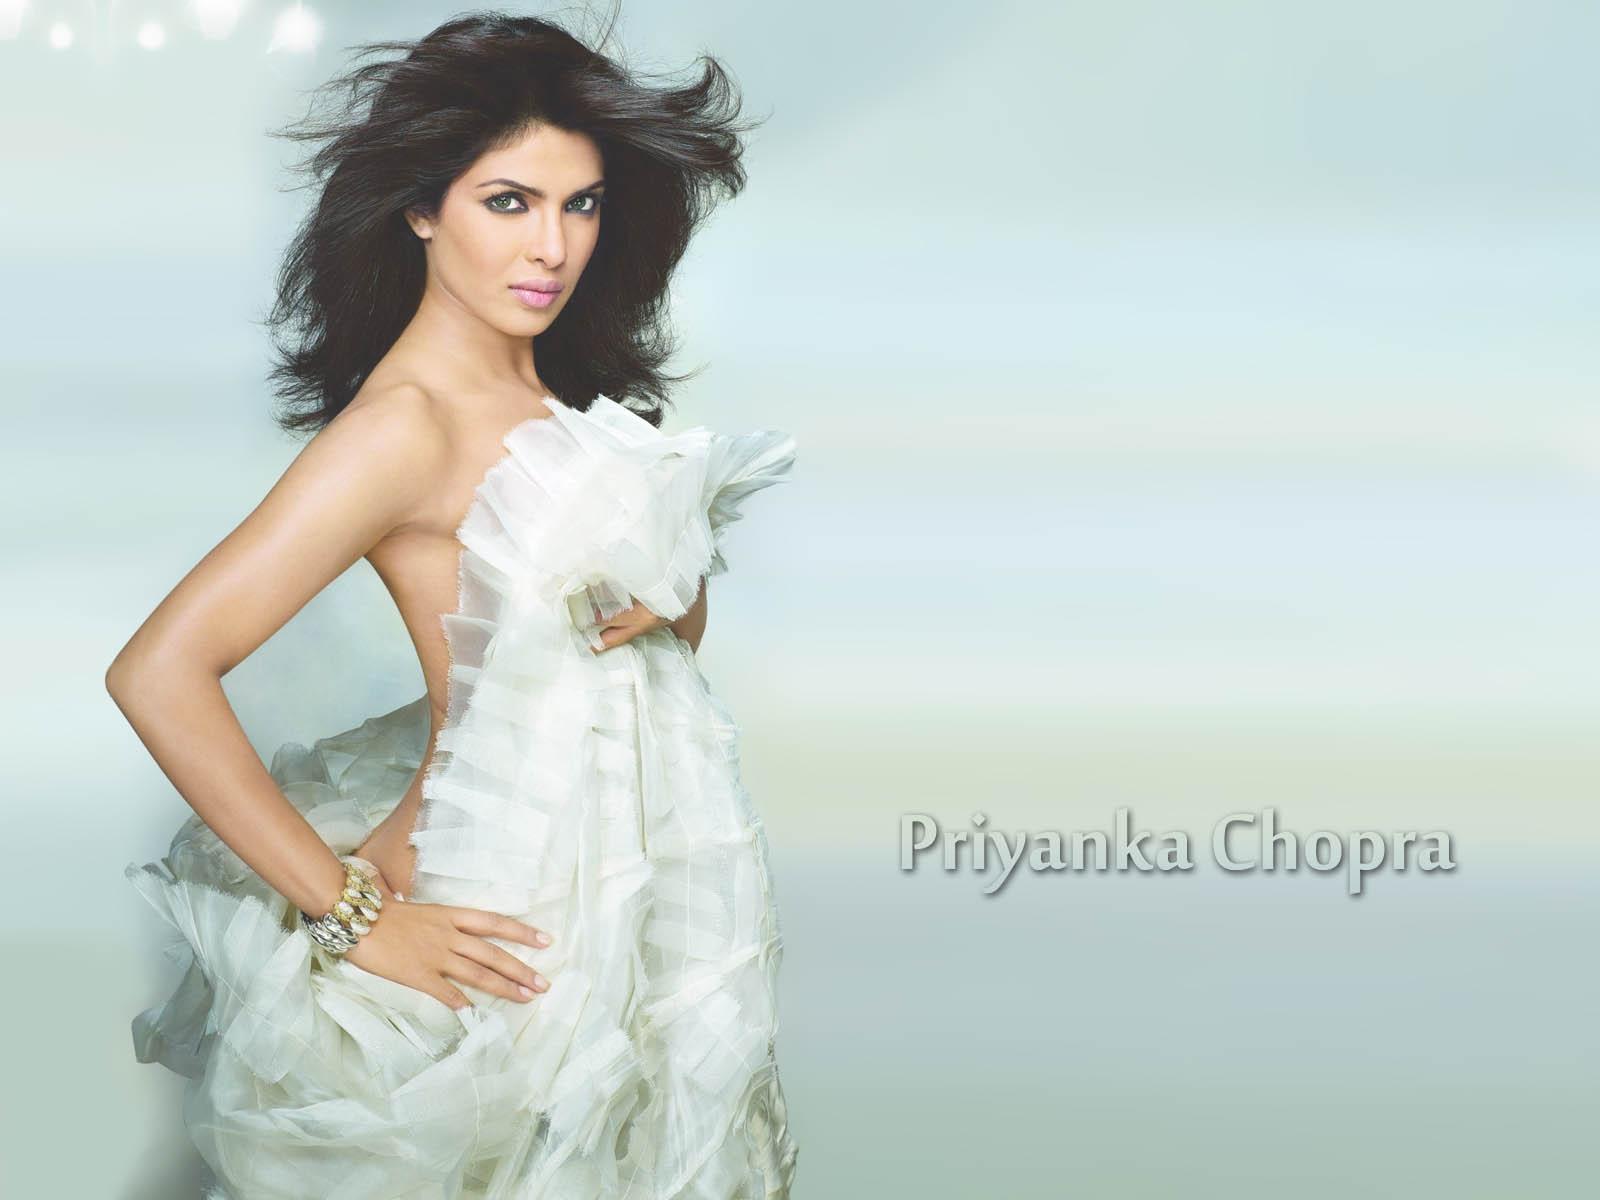 Indian Actresses Hub Priyanka Chopra Hot Pics Hub-8943